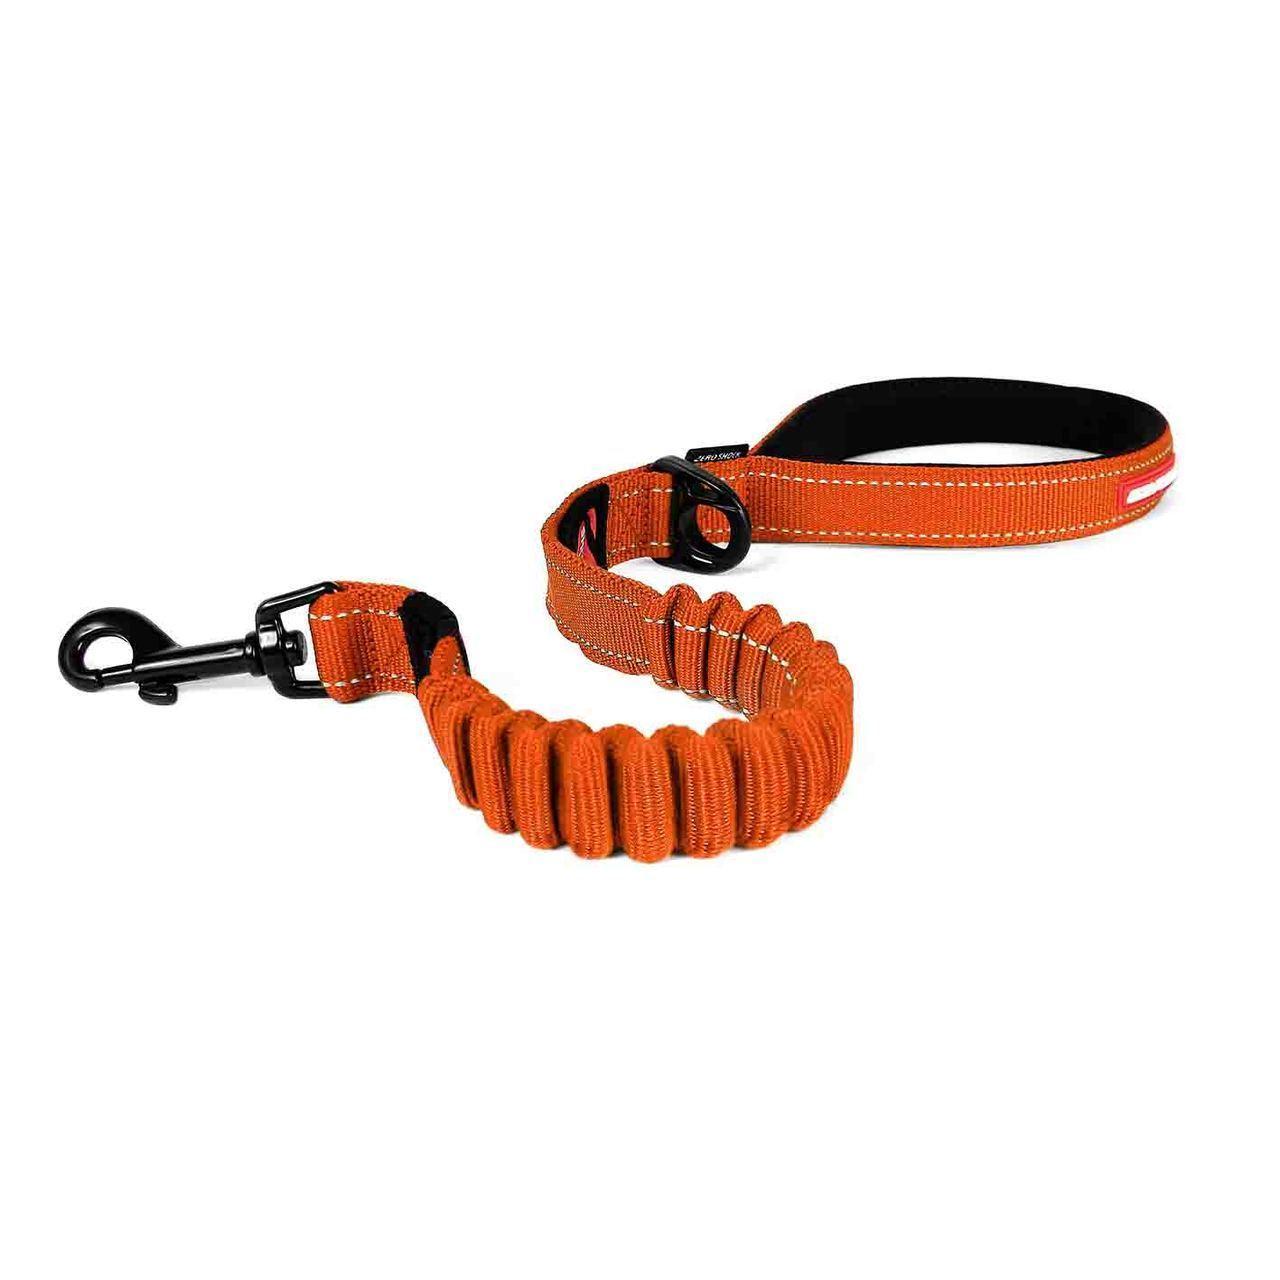 EzyDog Zero Shock Dog Leash - Blaze Orange